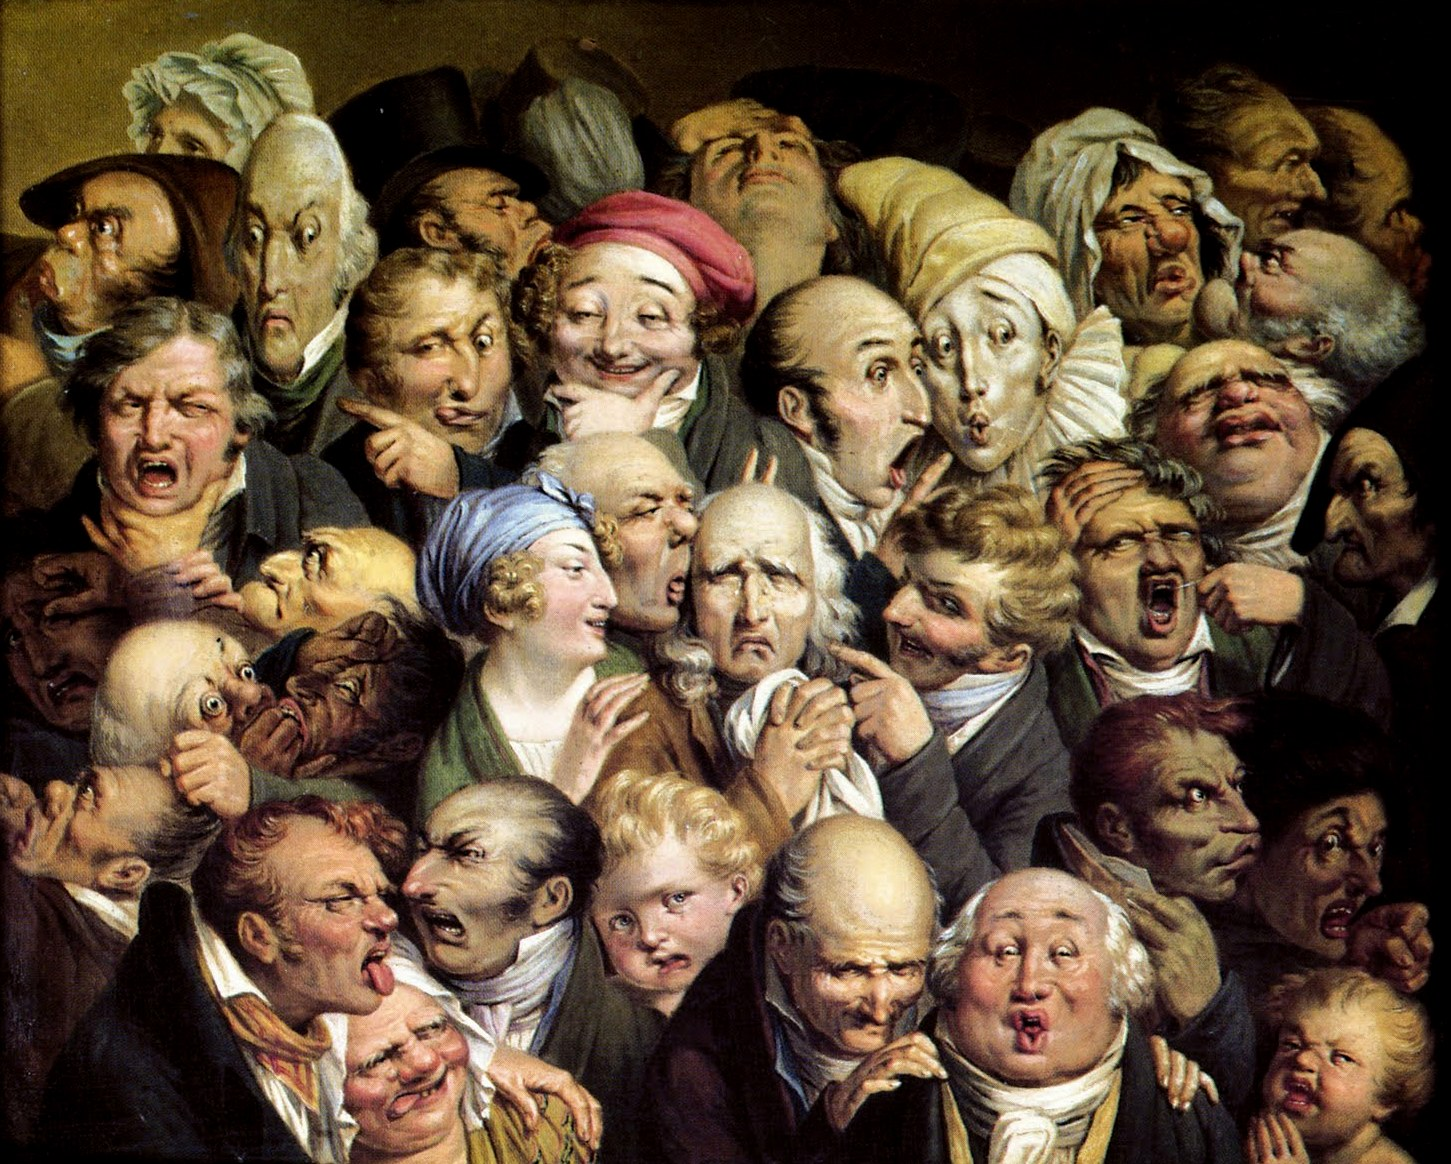 Louis-Leopold Boilly Reunion de 35 tetes diverses (1824 ca.). ©Collezione Privata Tropmi / Manuel Cohen